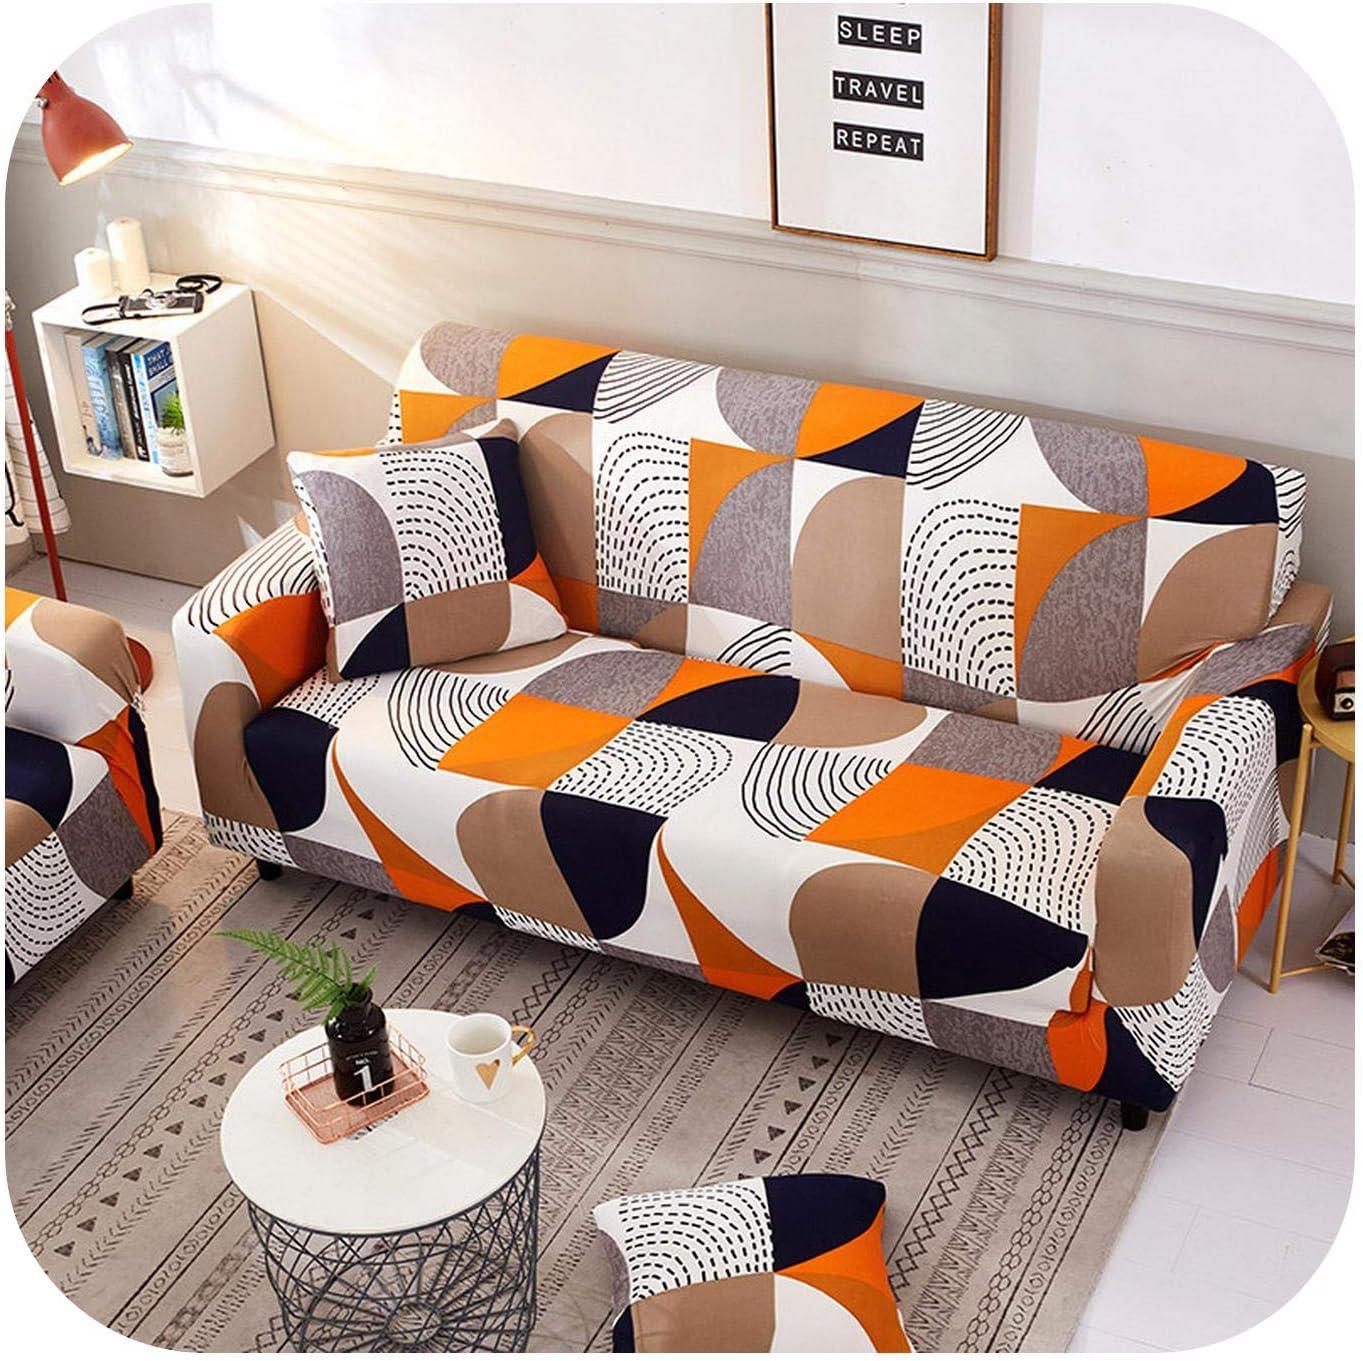 Lanng Parsons Chair slipcover Modern 注文後の変更キャンセル返品 Cover 早割クーポン for Sofa Livi Elastic